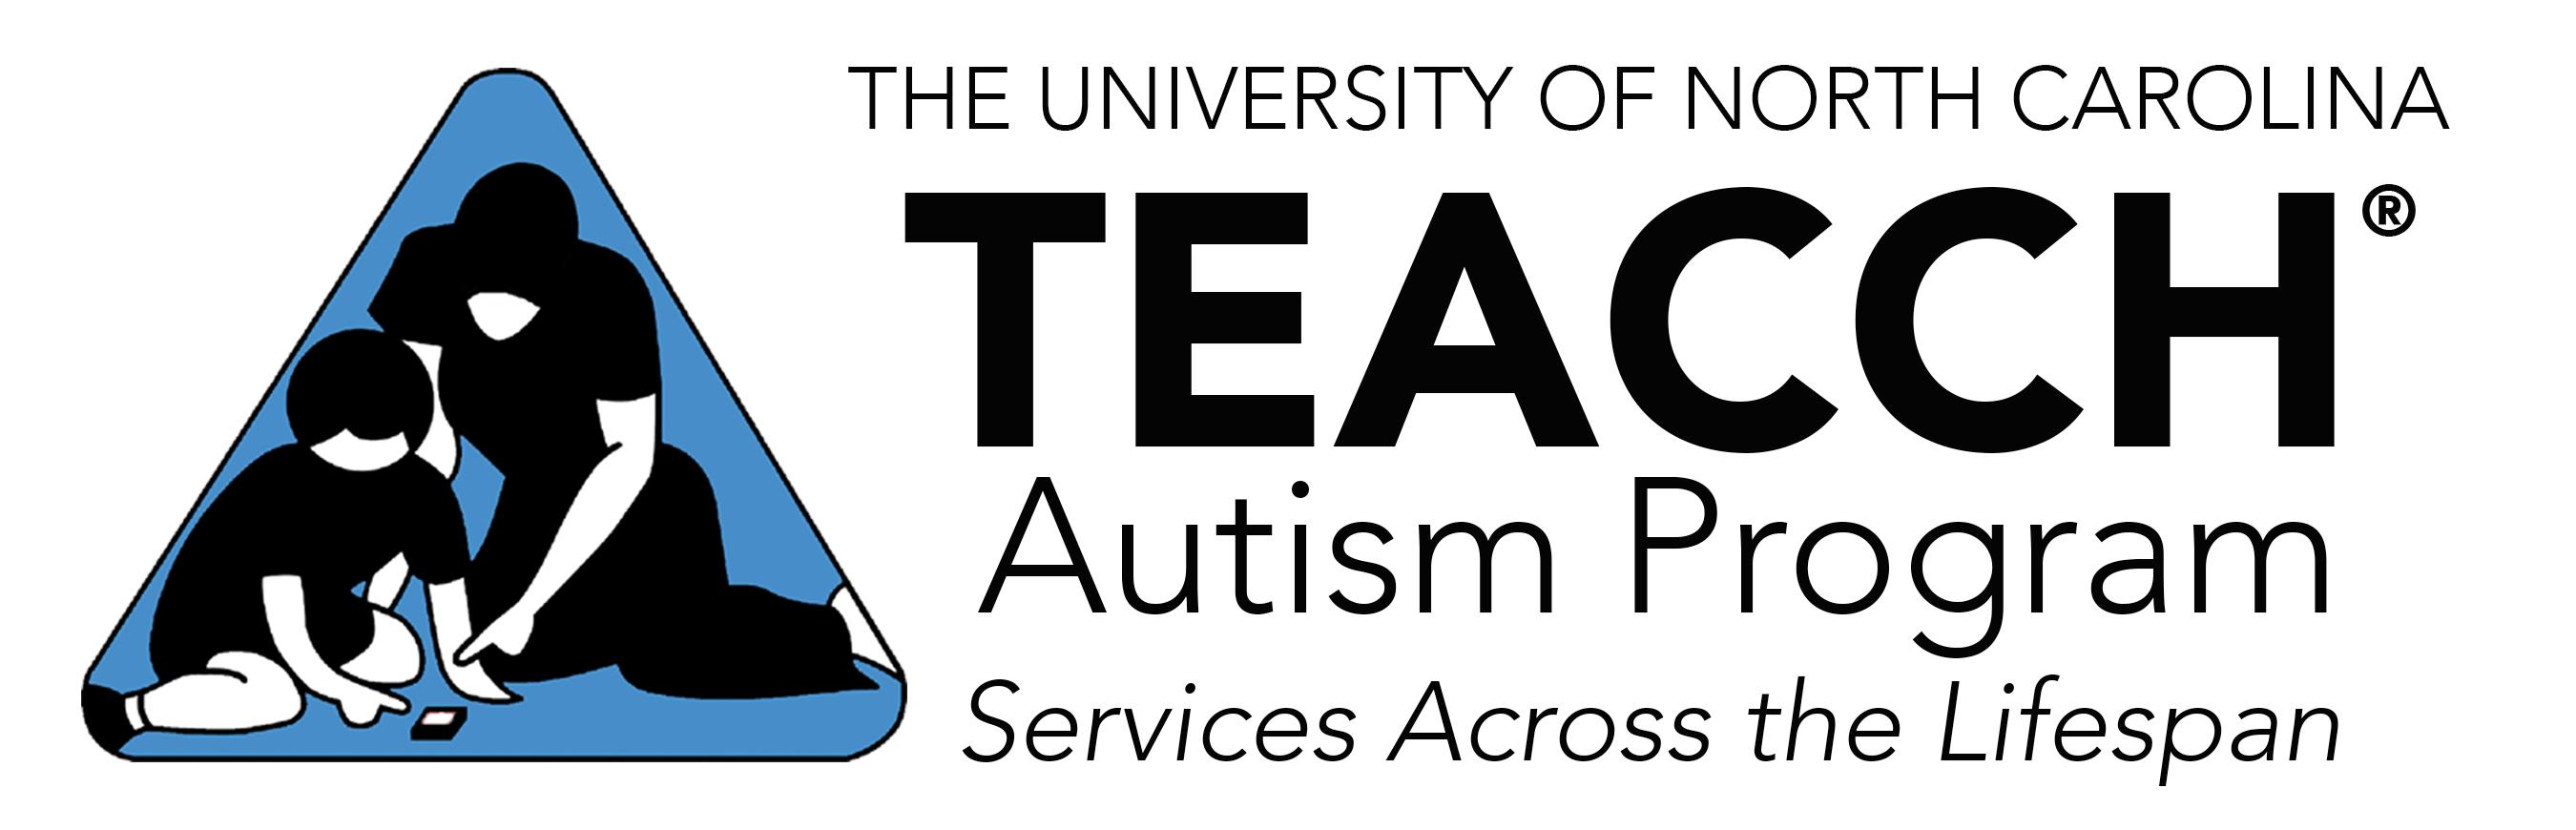 TEACCH_logo_2017